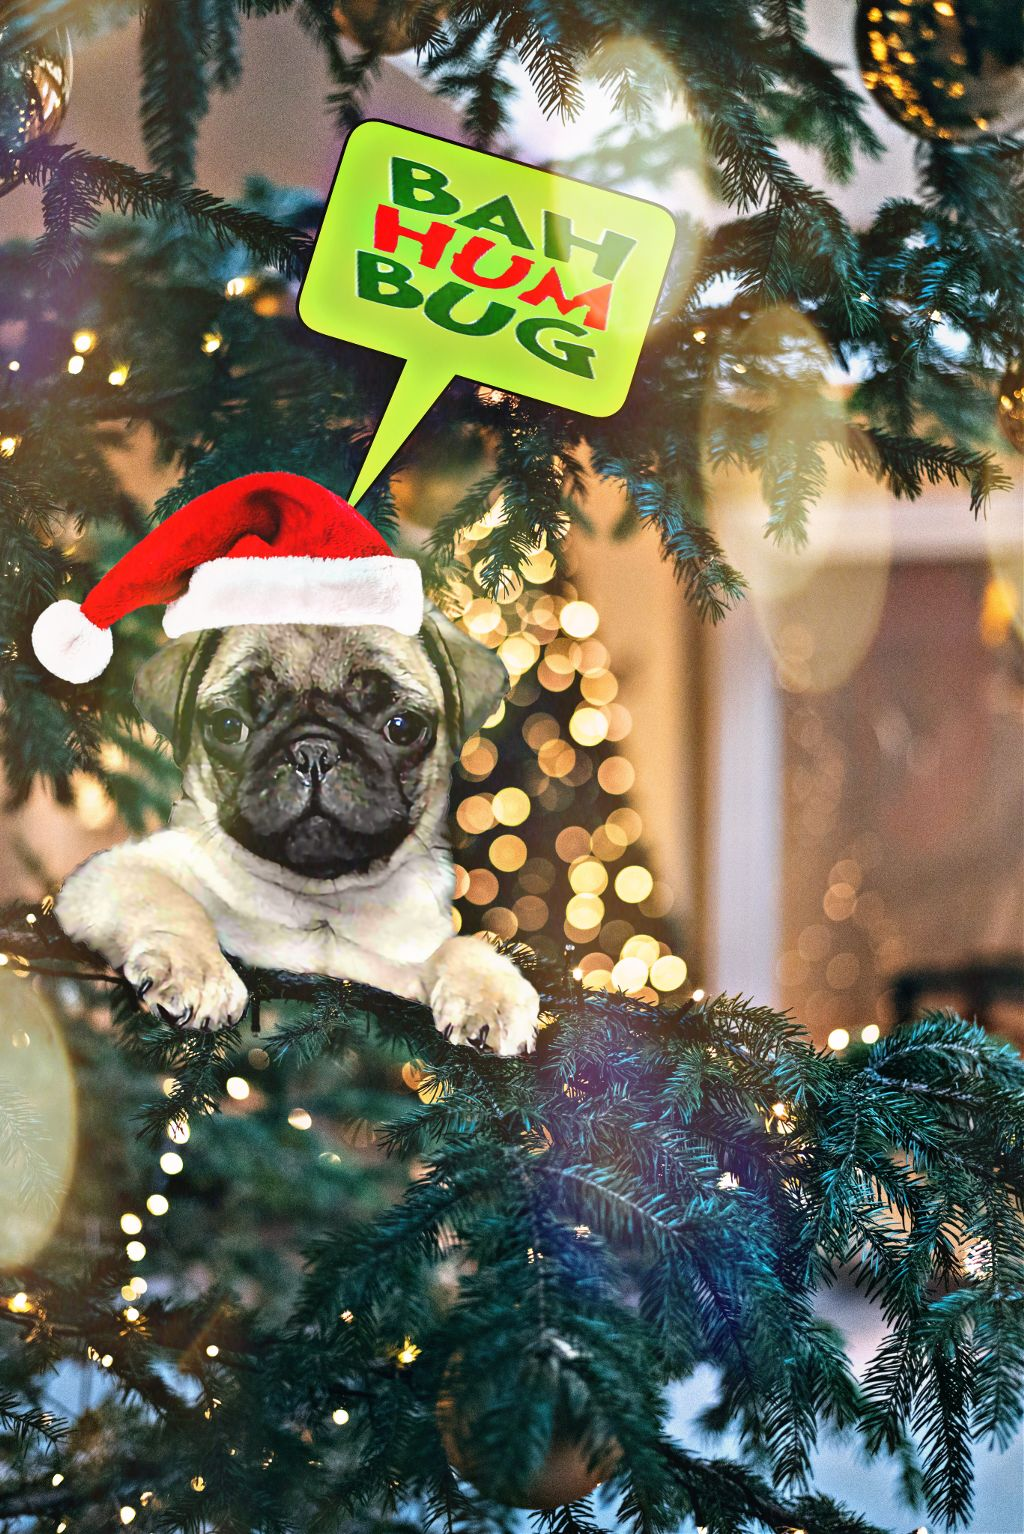 #freetoedit #pug #pupoy #dog #petsandanimals #tree #christmas #callout #text #quotesandsayings #bahumbug